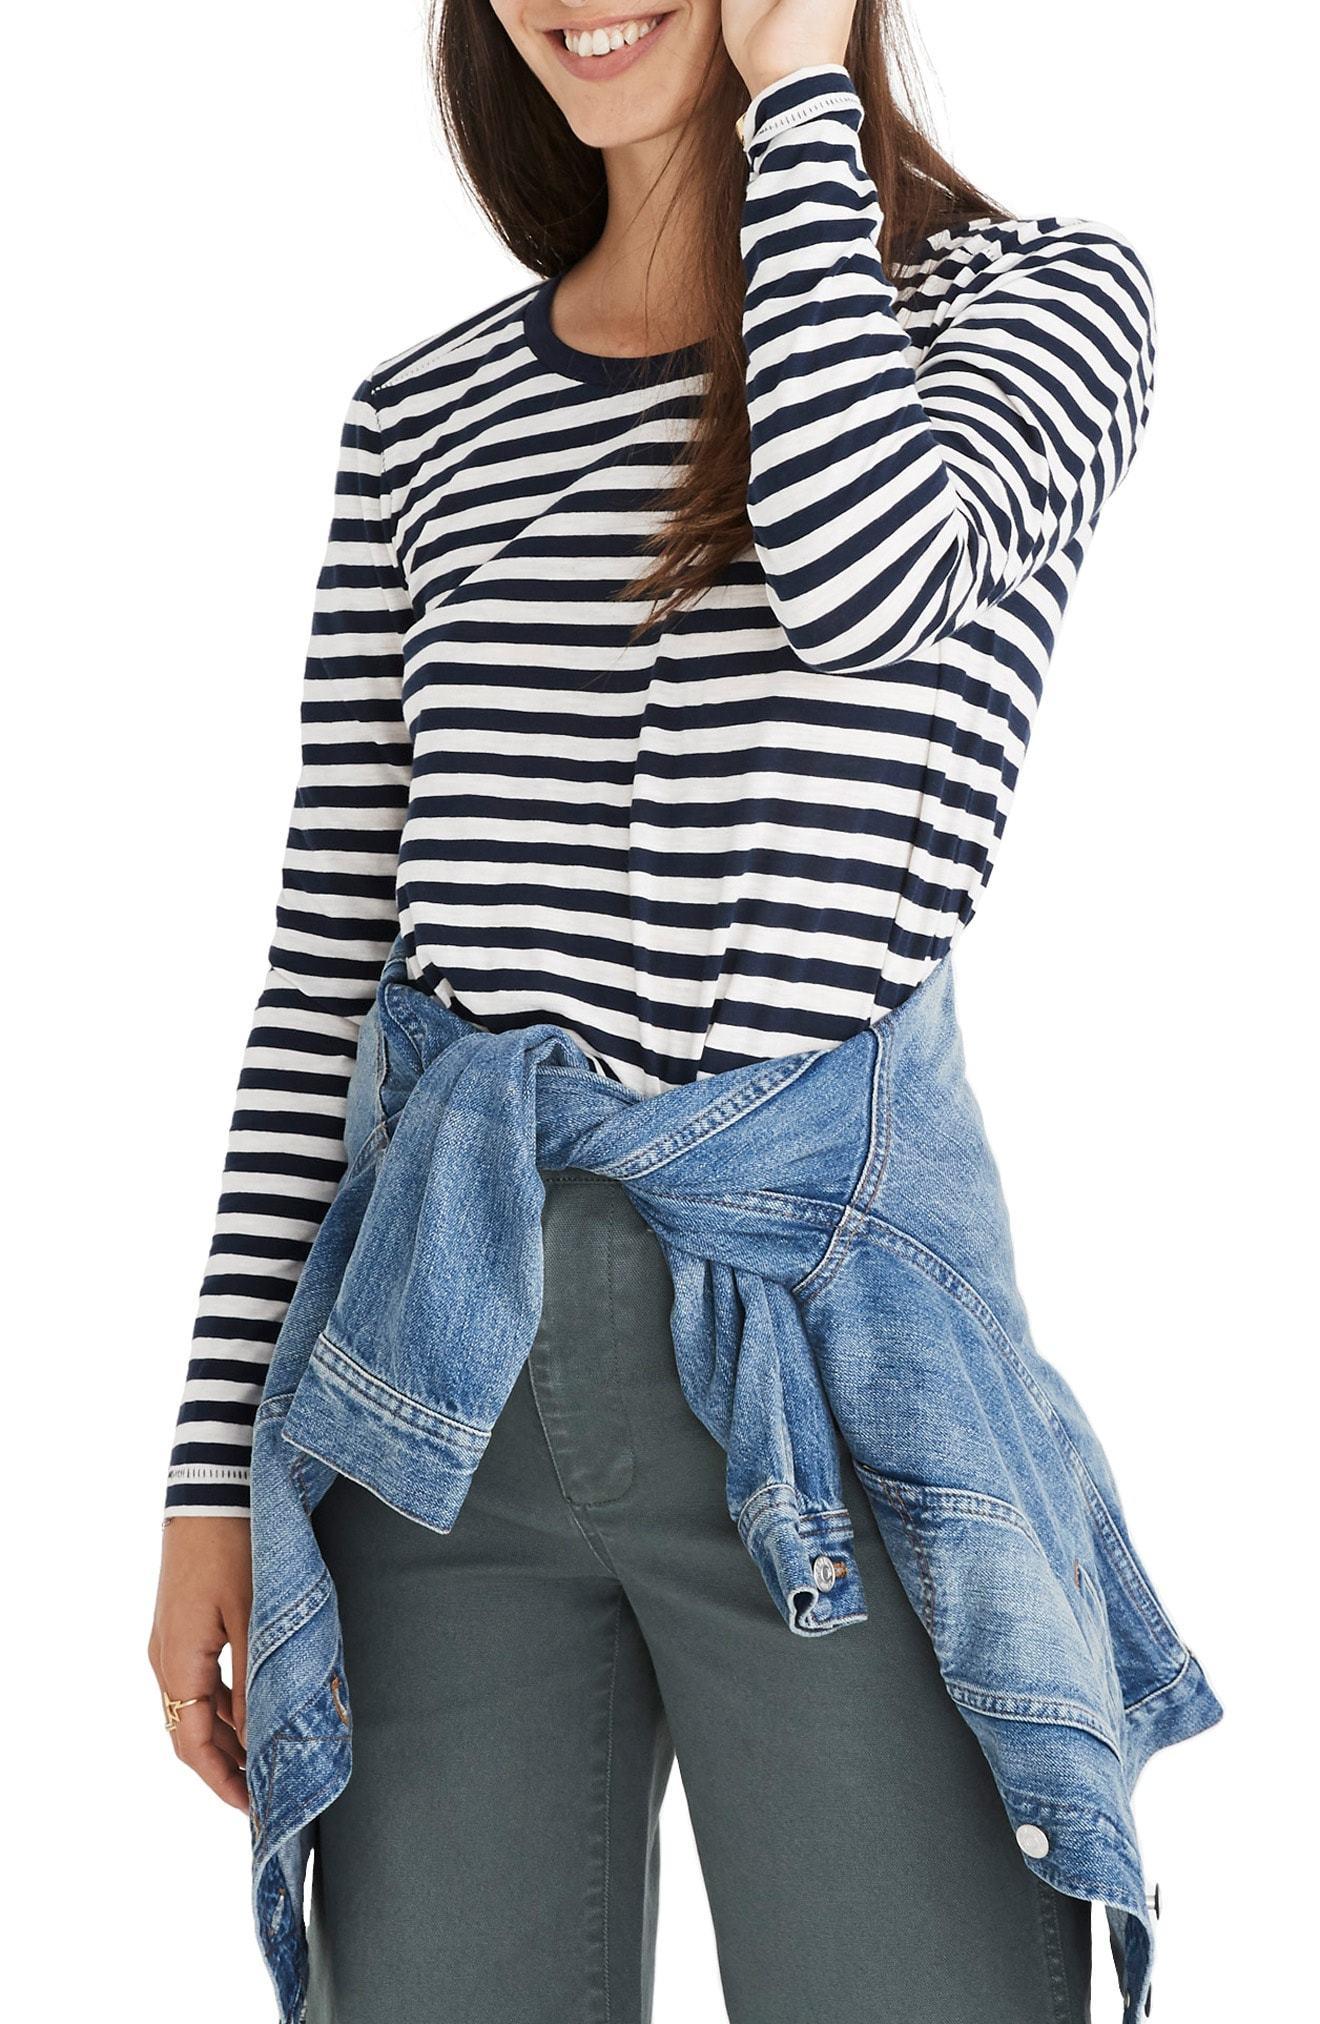 fe8c05dac4 Madewell Whisper Cotton Stripe Long Sleeve Crewneck Tee, $32 ...